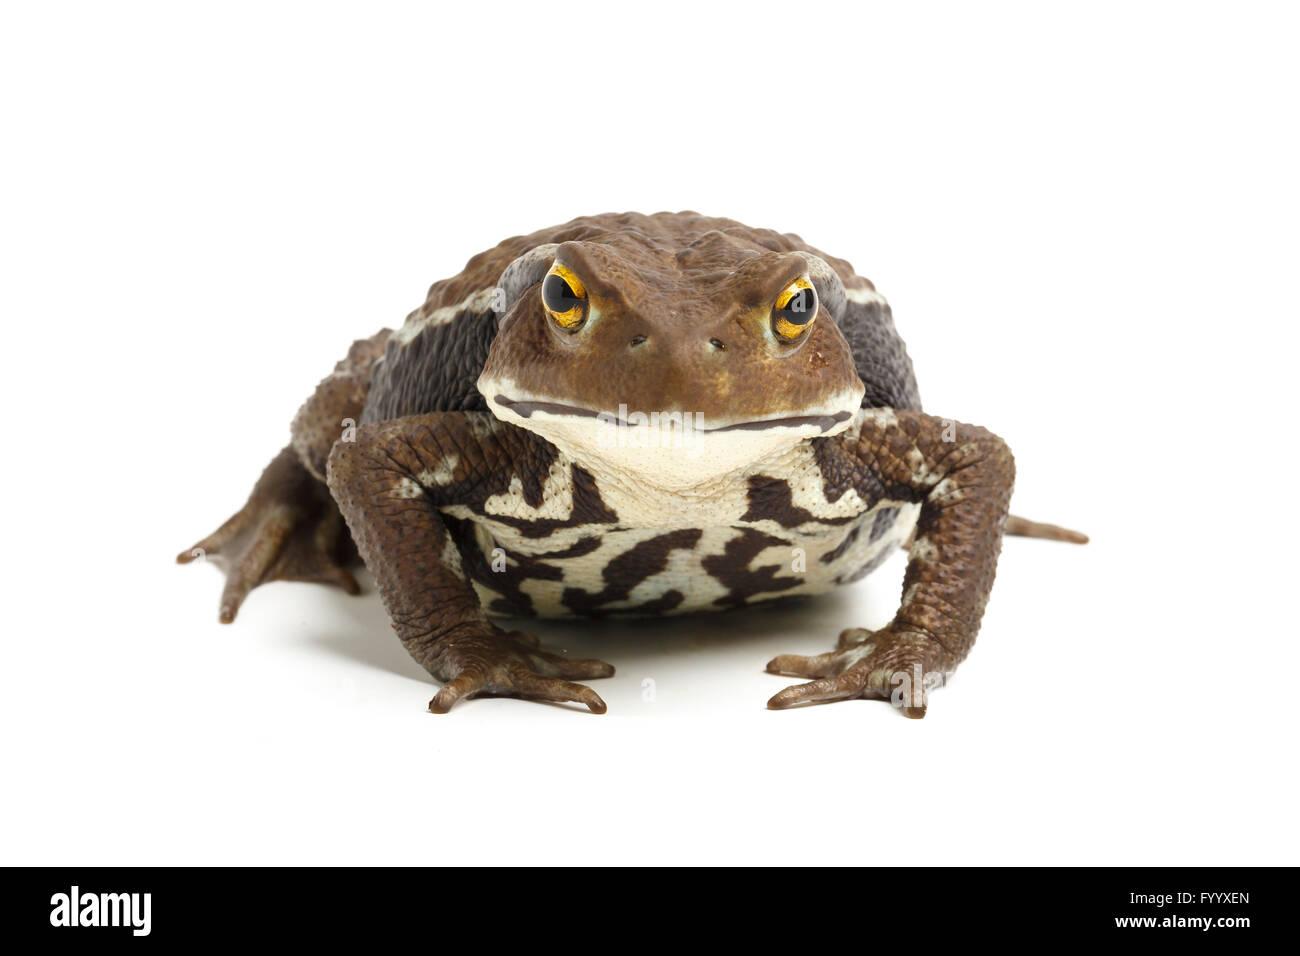 Japanese Common Toad, Bufo japonicus. Captive (origin Japan). Bufonidae - Stock Image